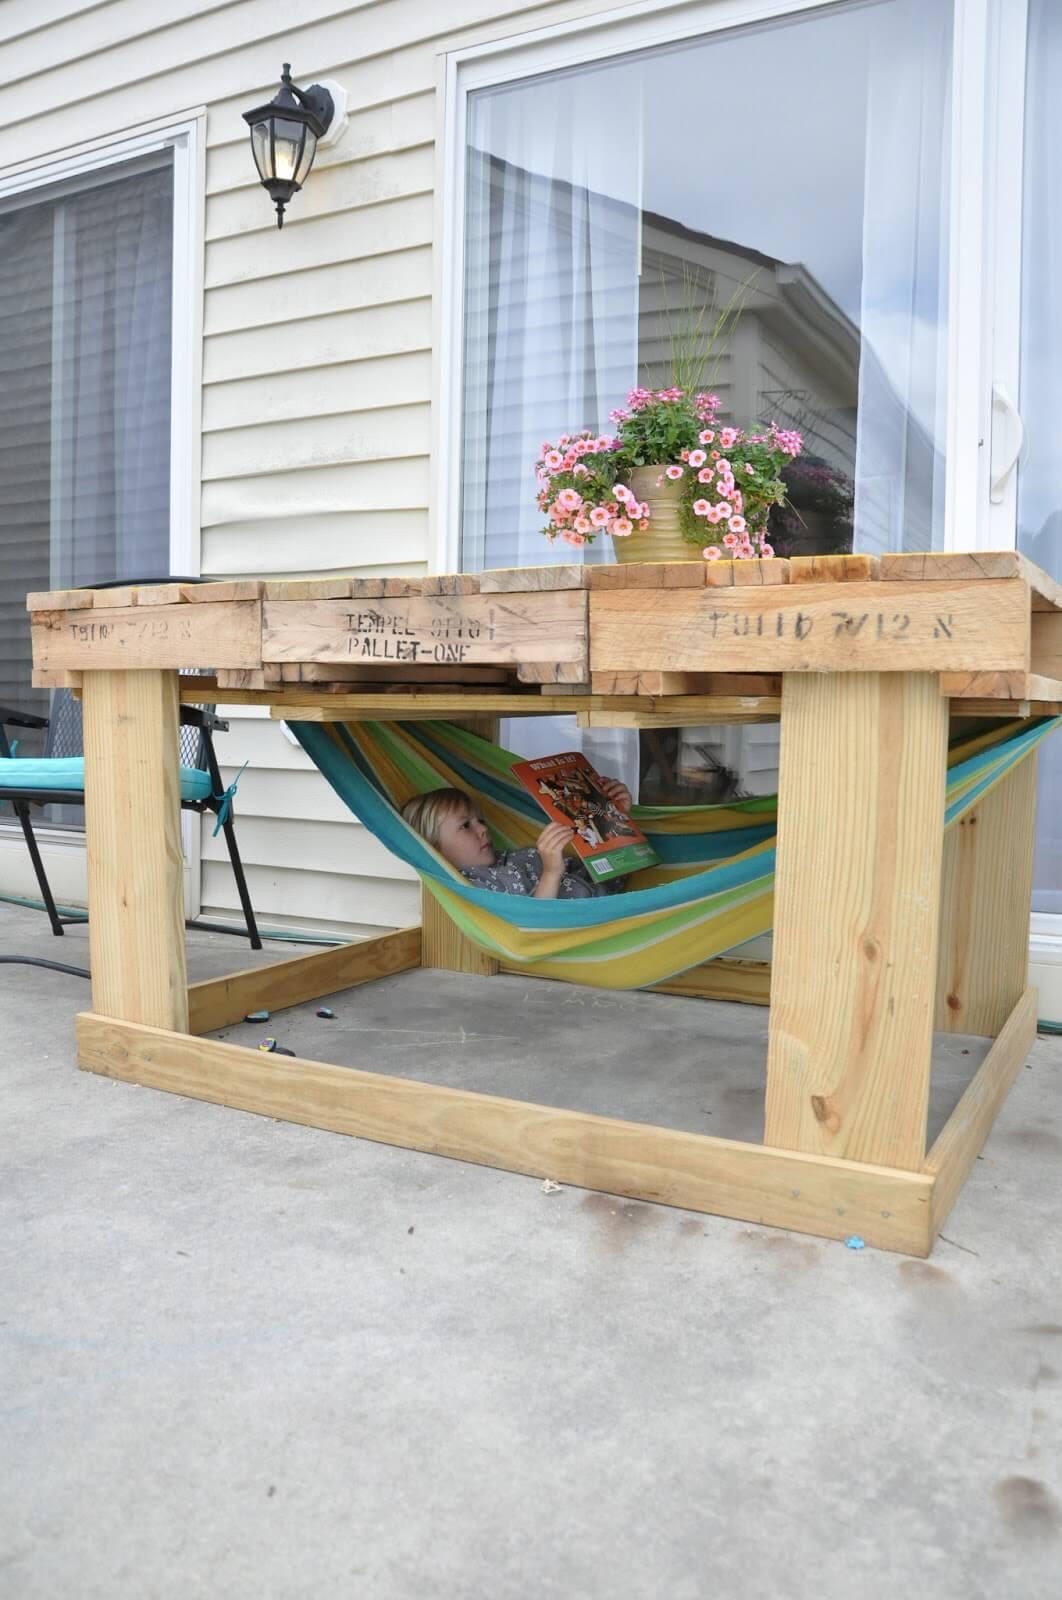 Versatile Outdoor Table and Hammock Retreat